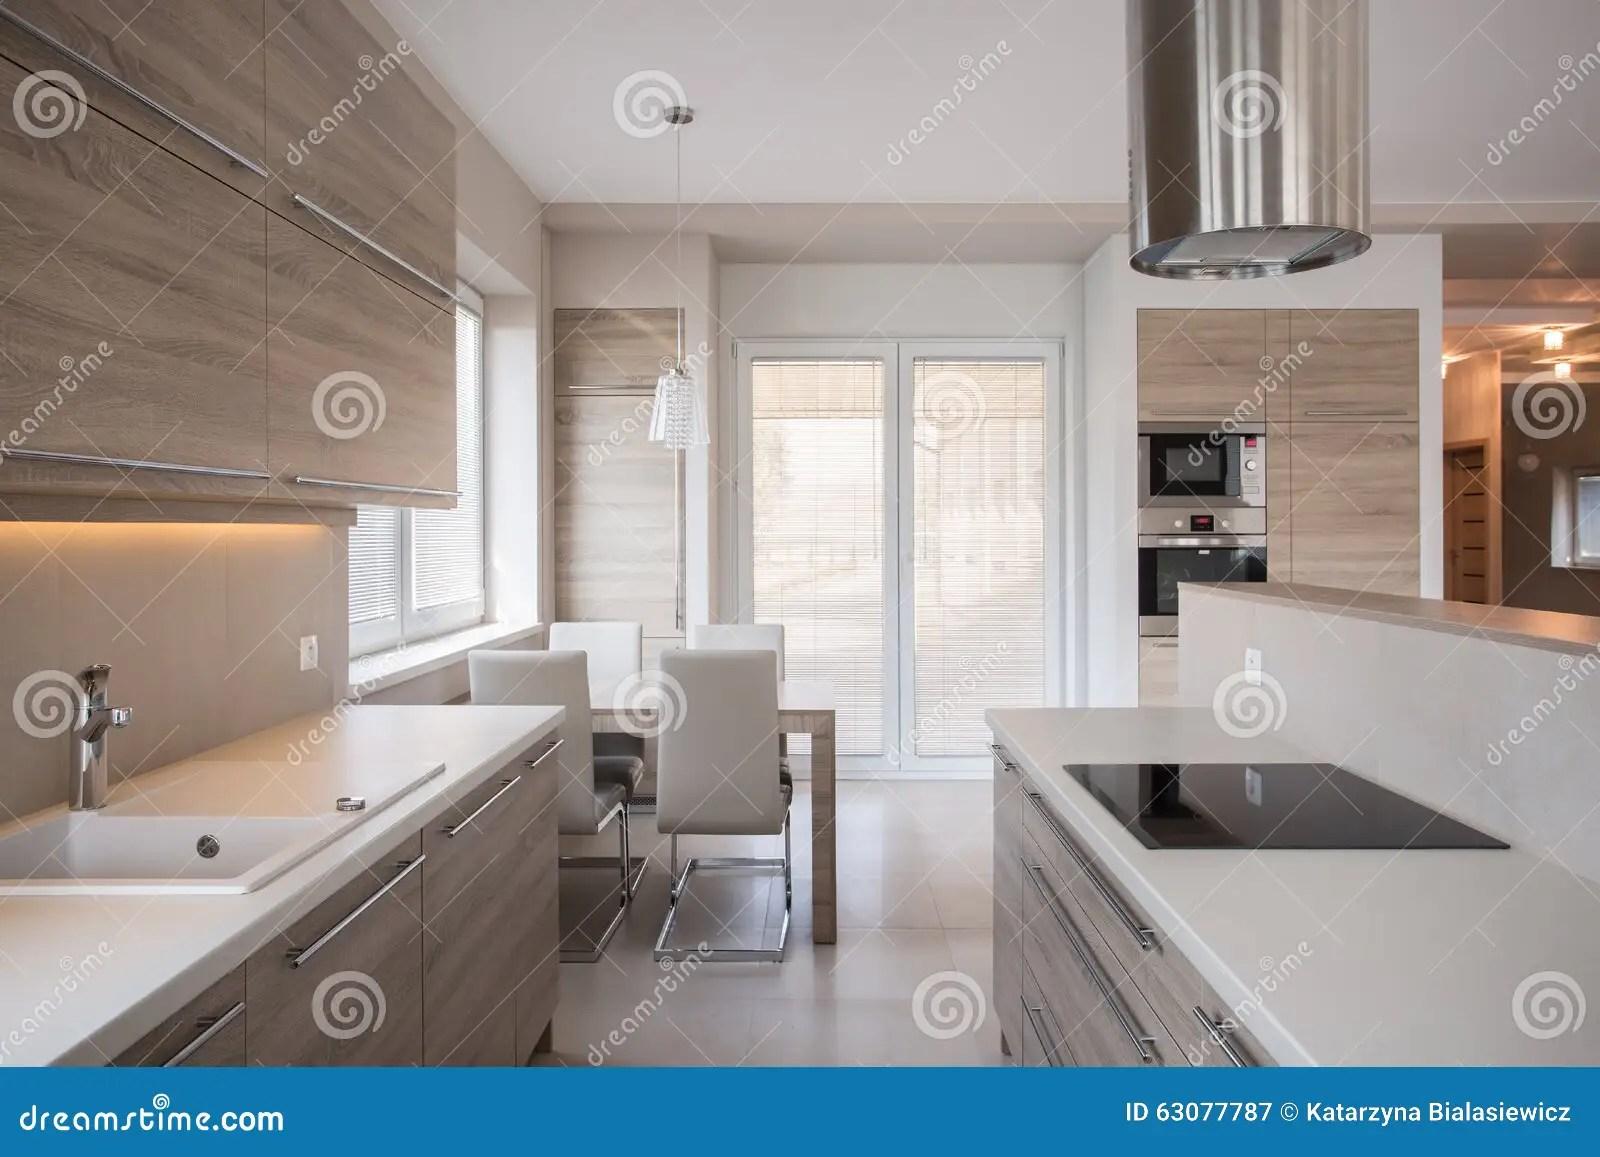 luxury kitchen faucets sink grid 现代设计的豪华厨房库存图片 图片包括有豪华 时髦 空白 任何地方 现代设计的豪华厨房